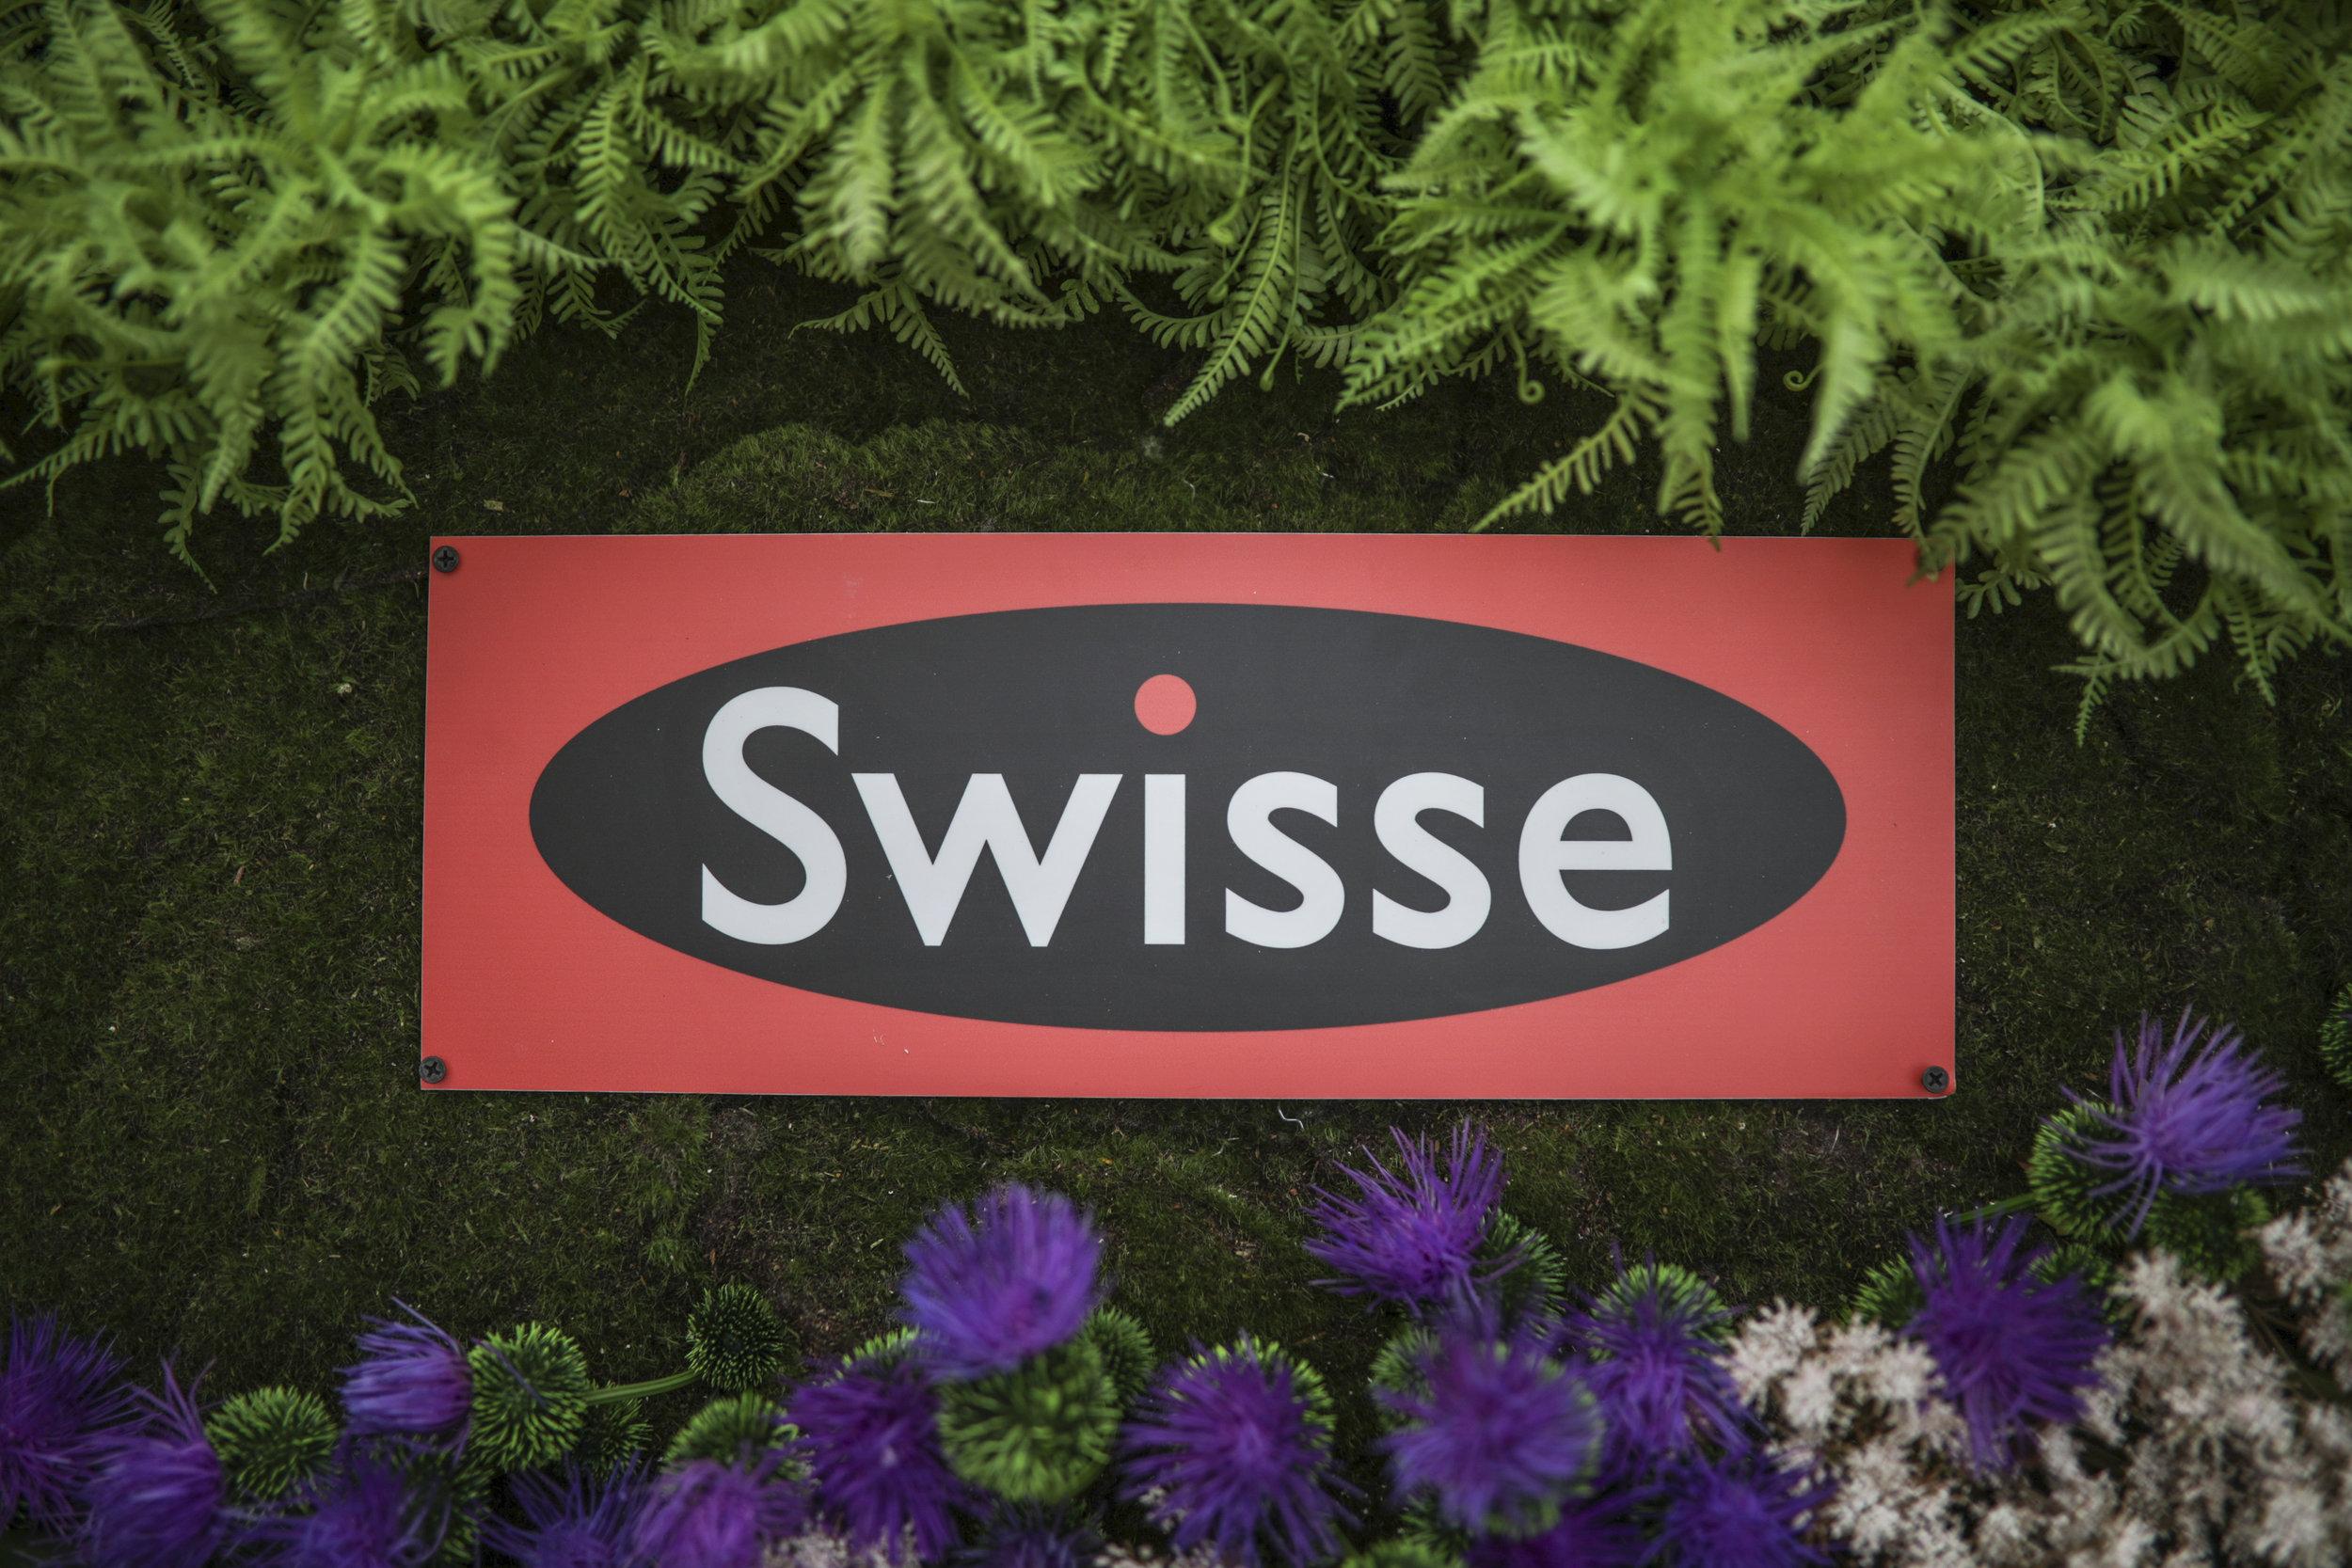 O Hello Media-Swisse-Wanderlust-A81A0430.jpg